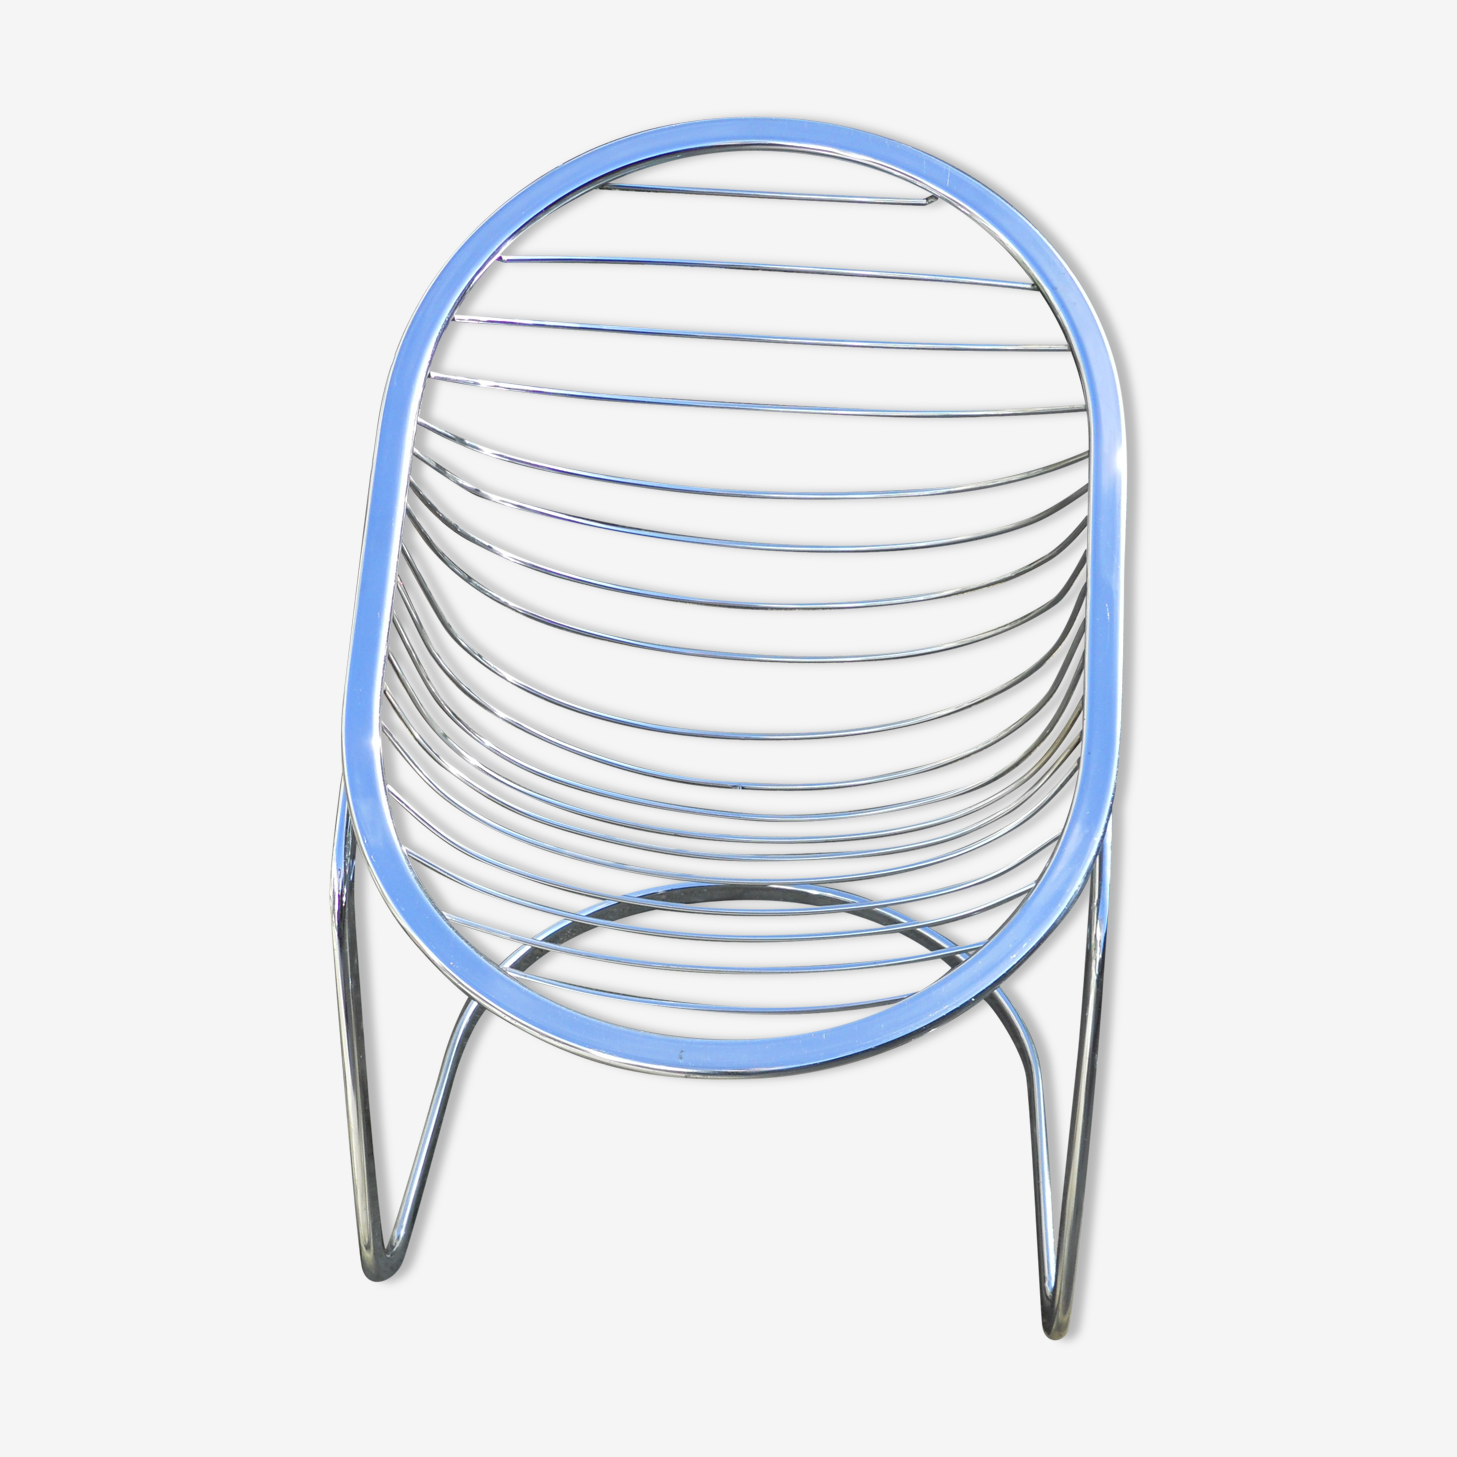 Flesh gastone rinaldi egg chair